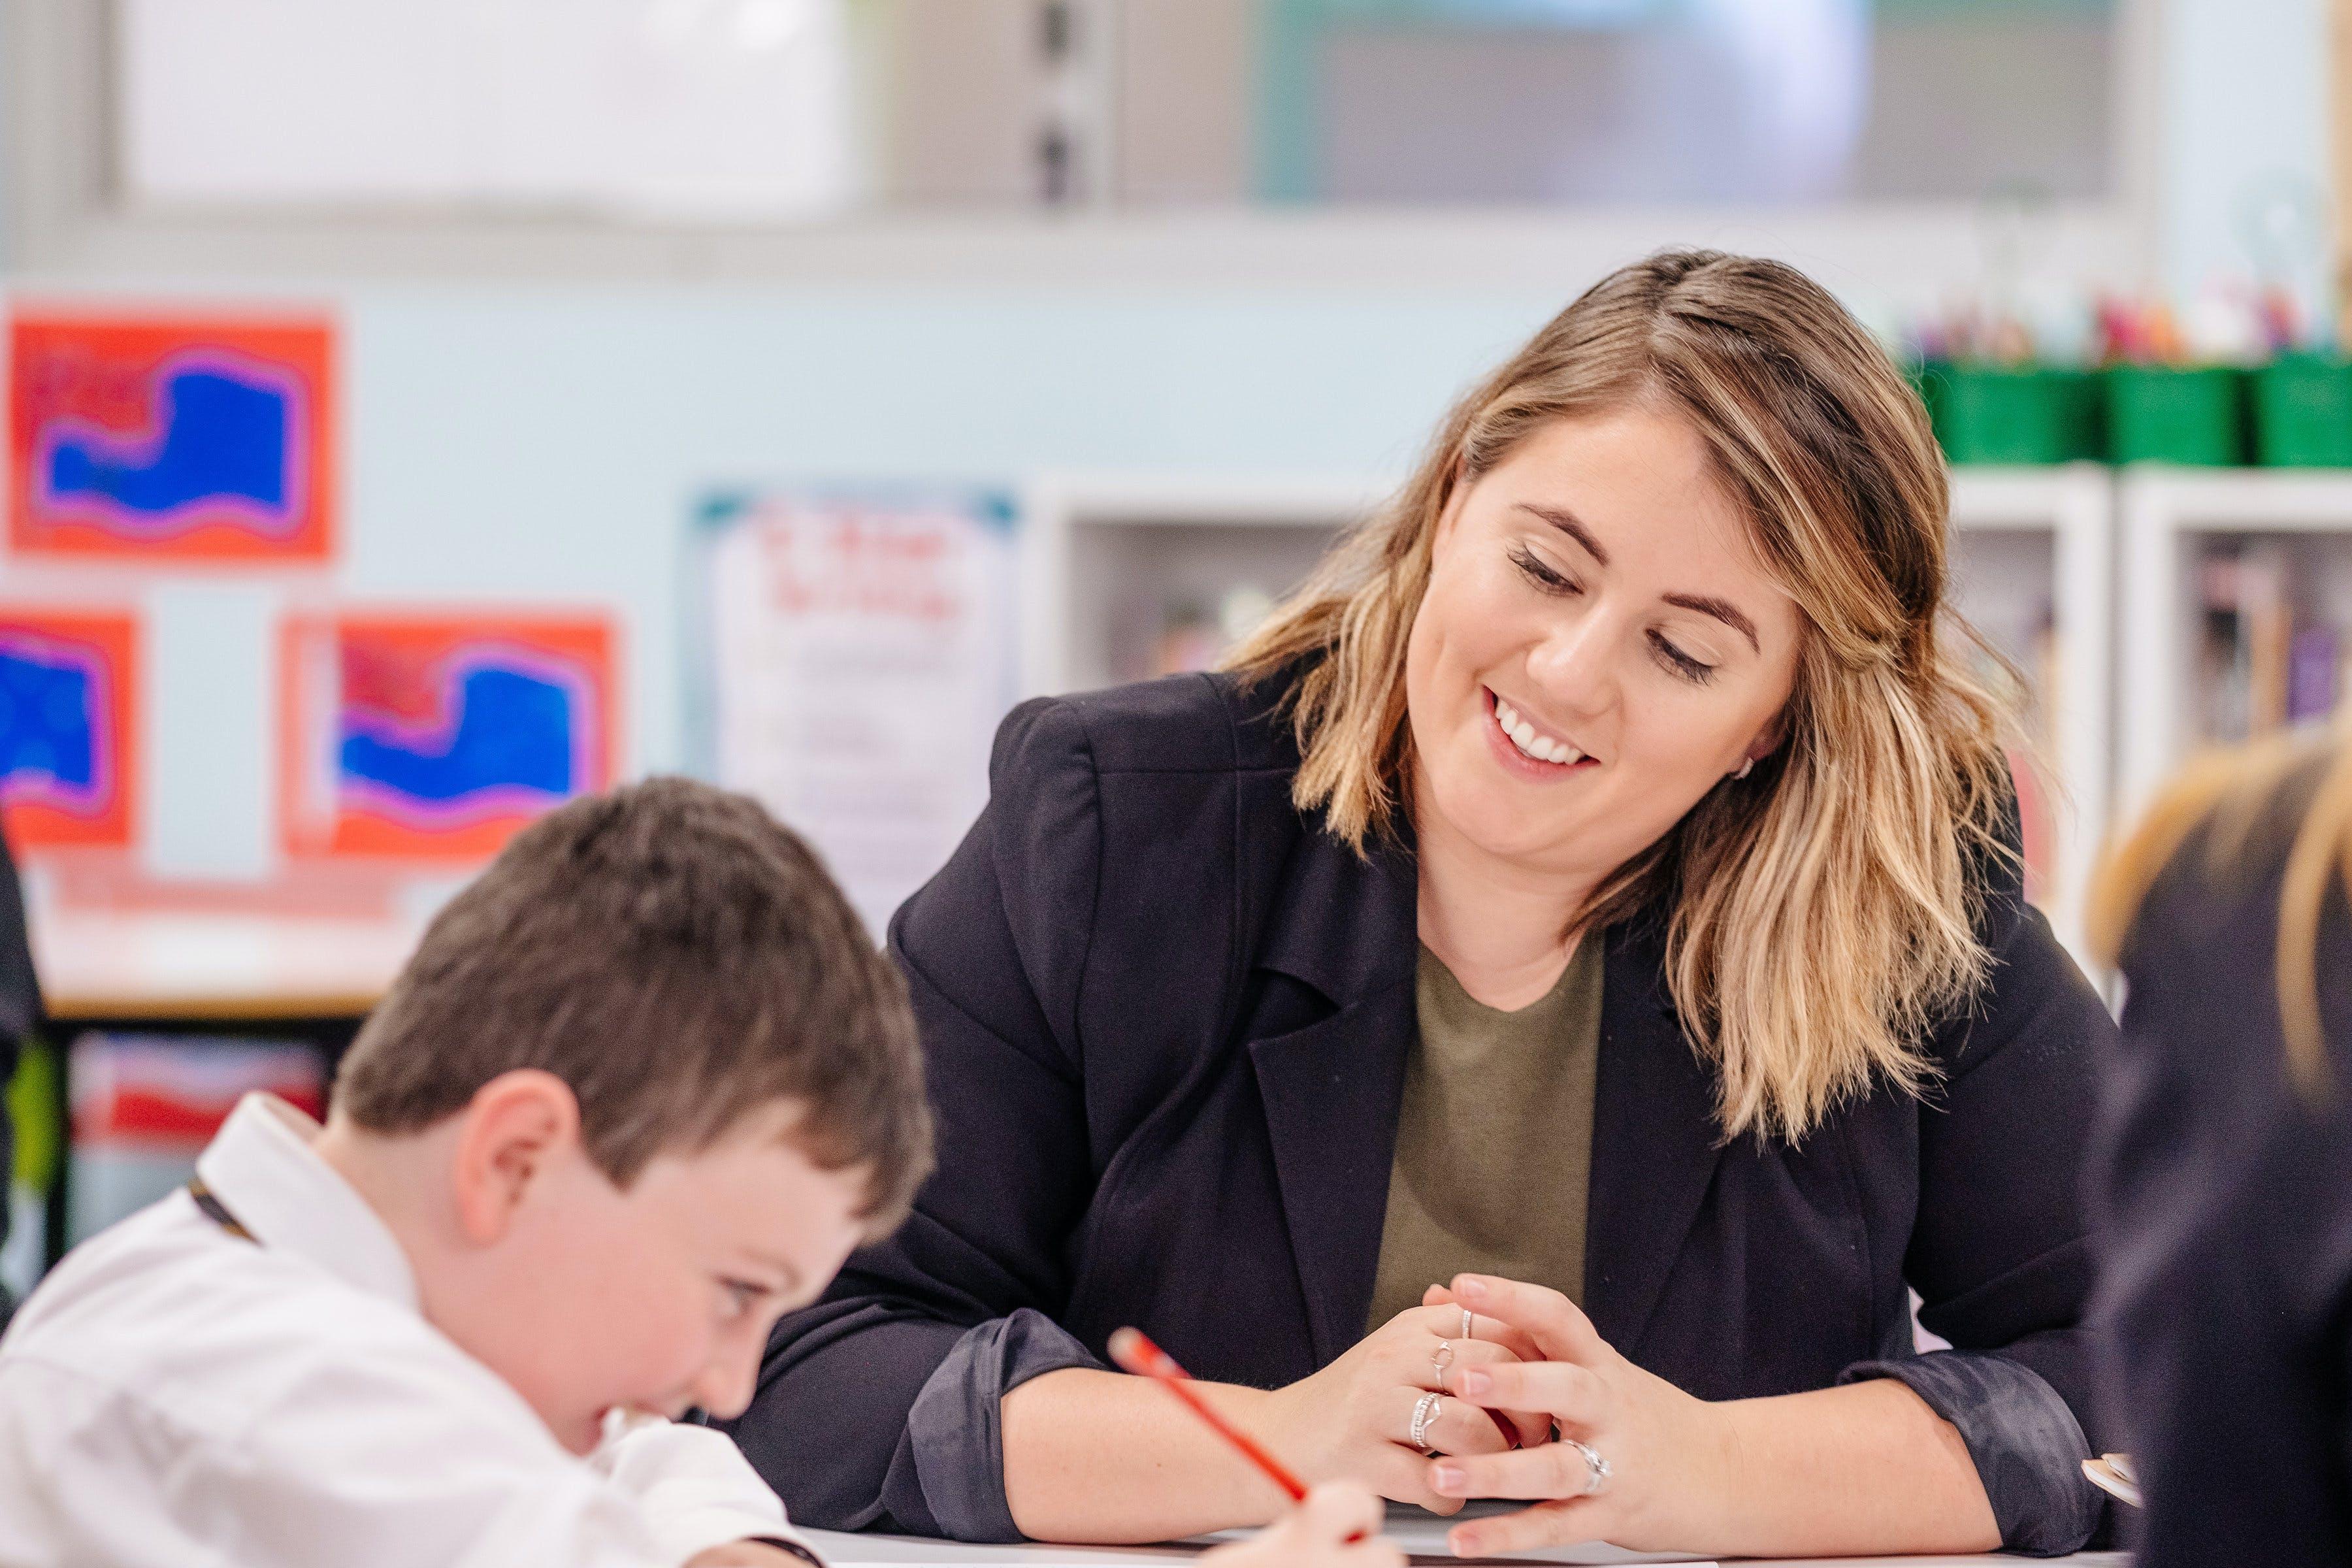 Teaching School 1 1